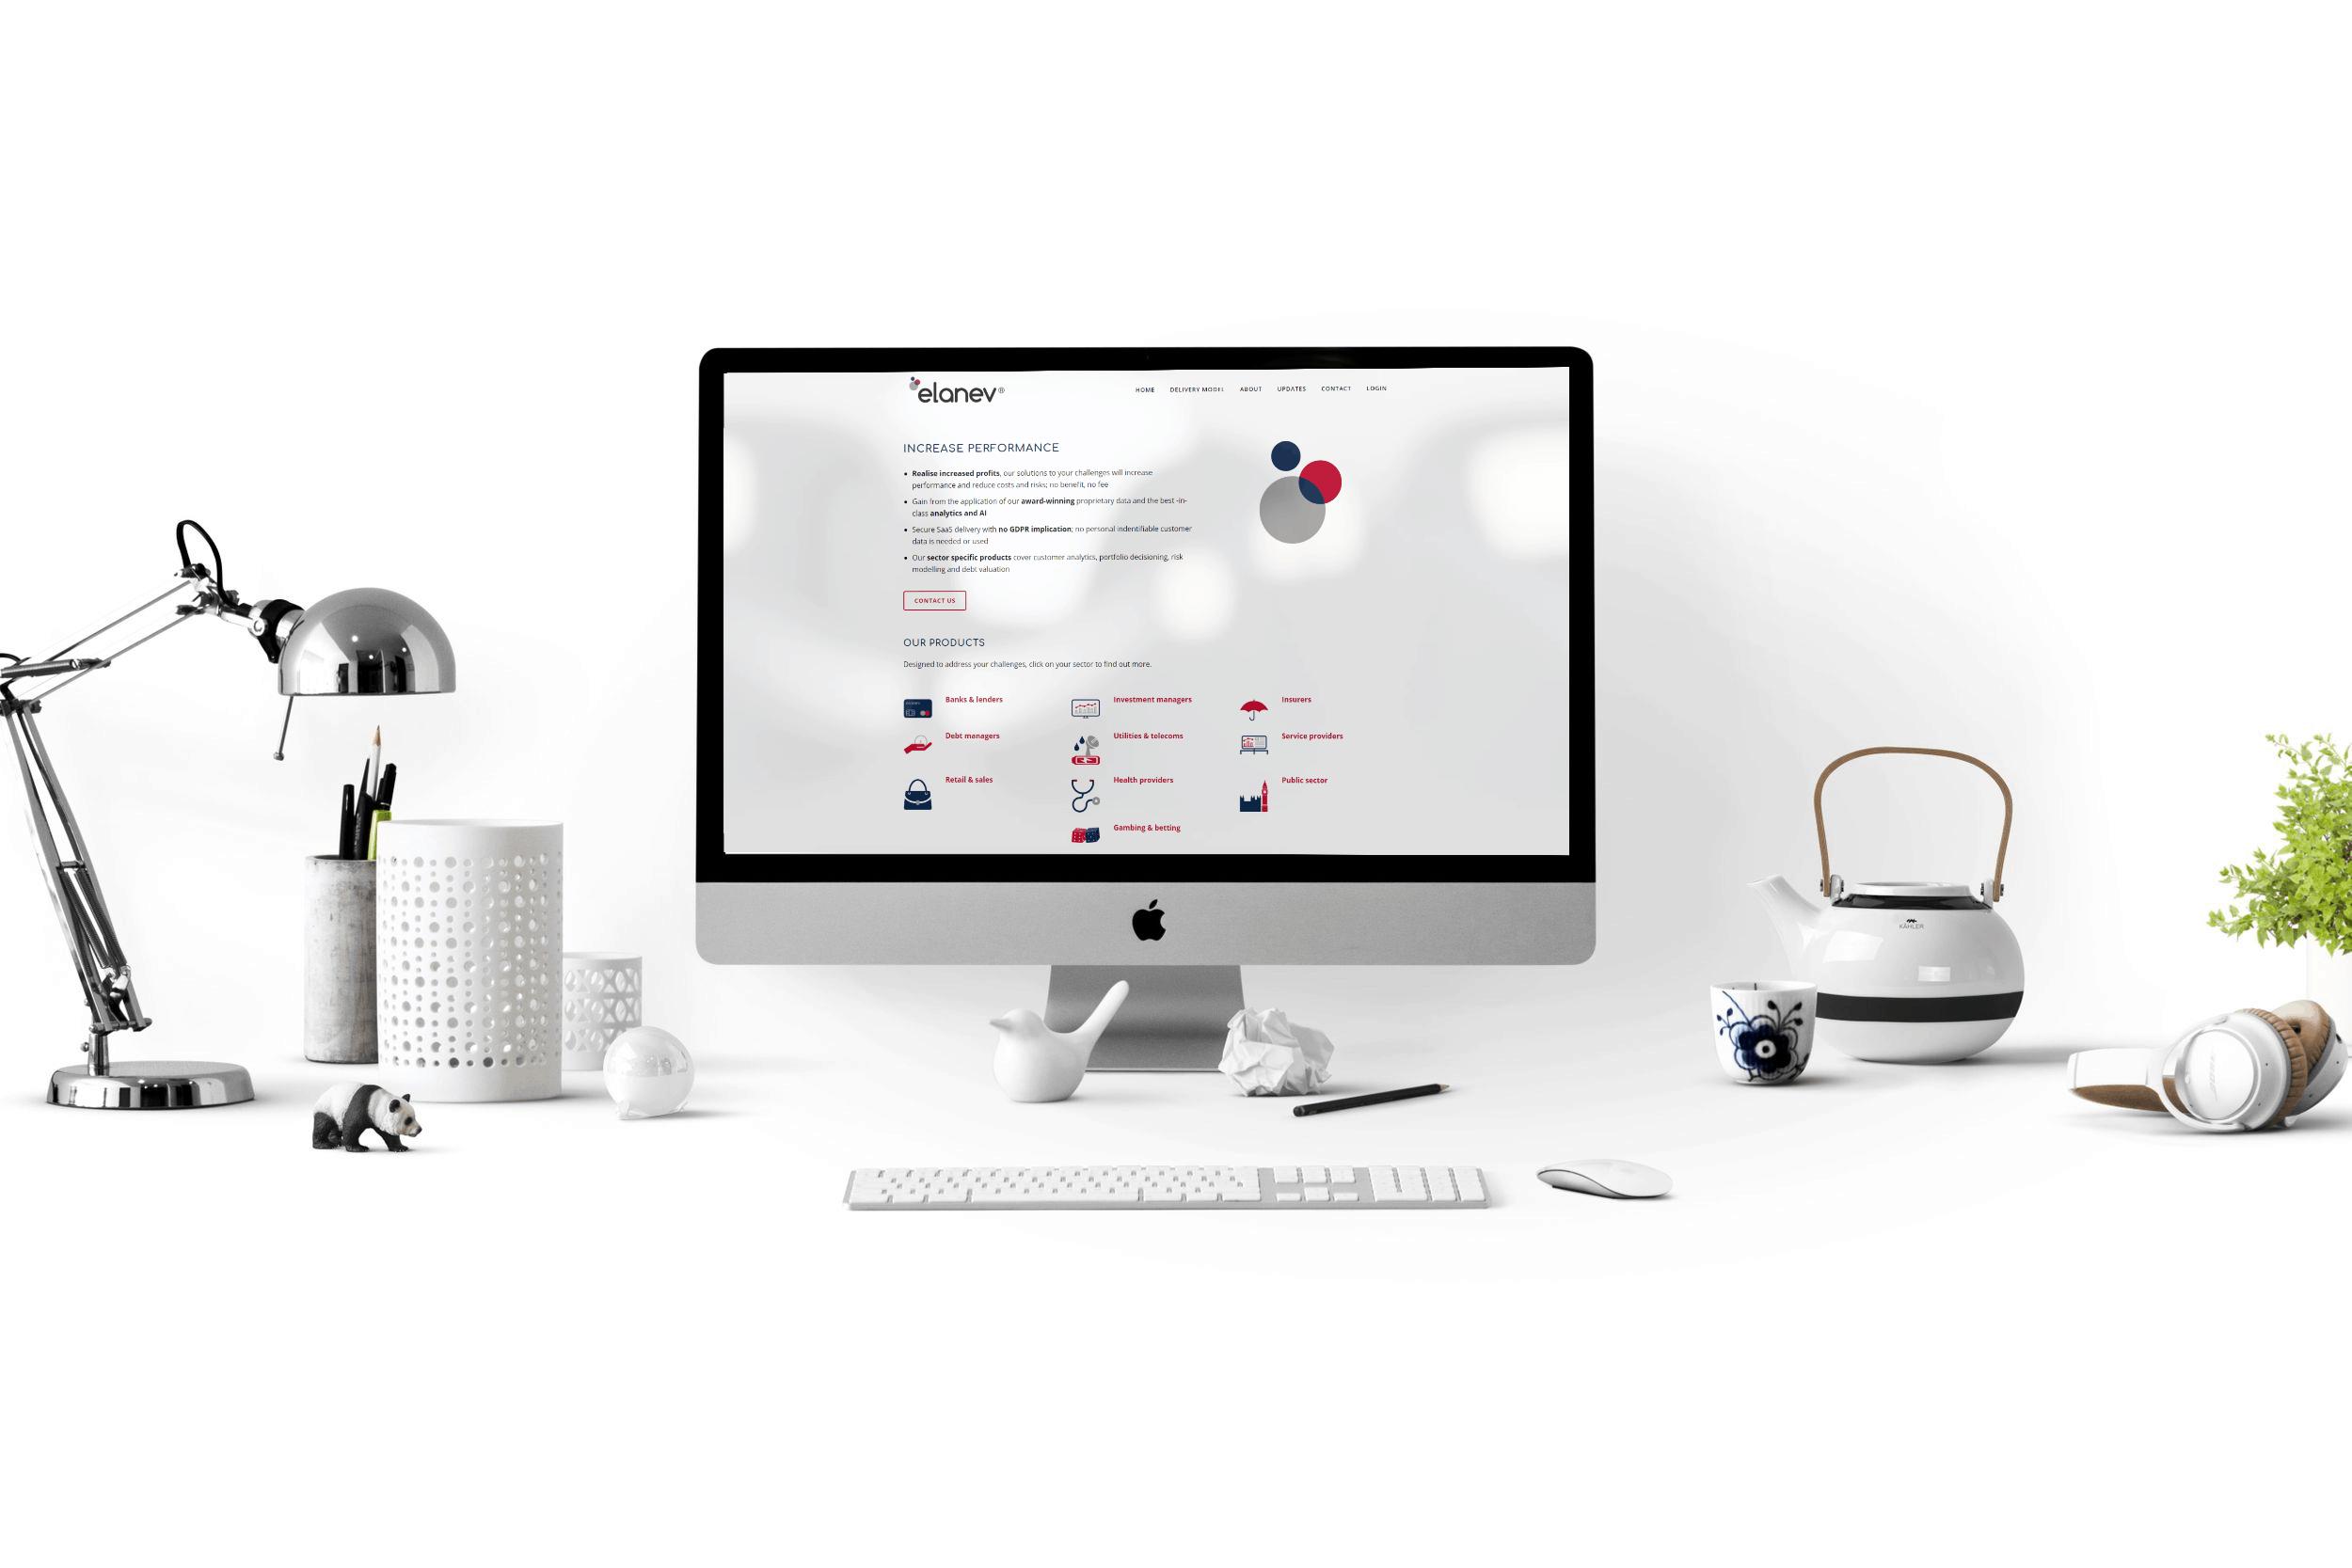 elanev web design